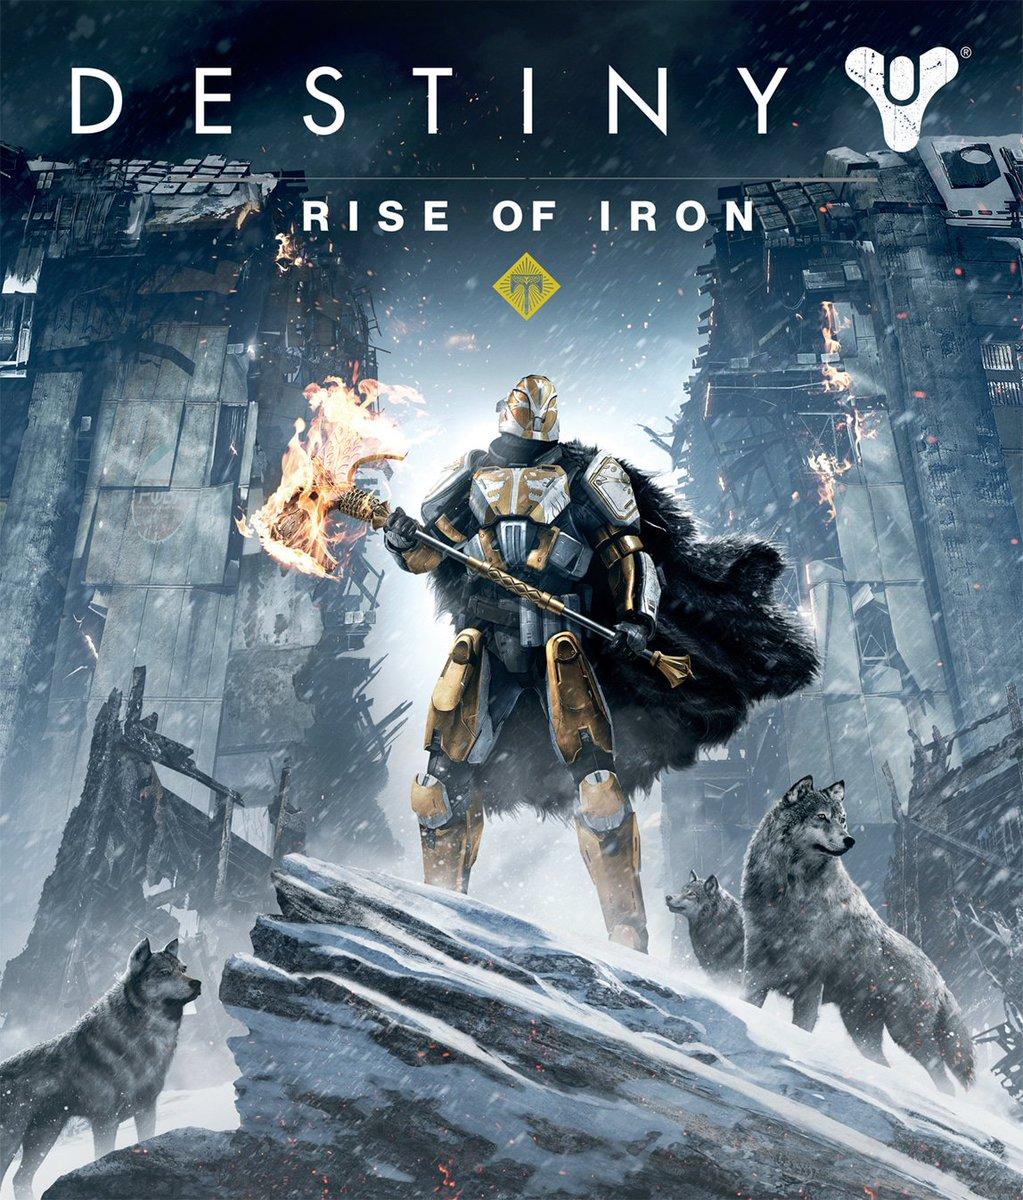 Destiny: Rise of Iron Reveal Trailer 5